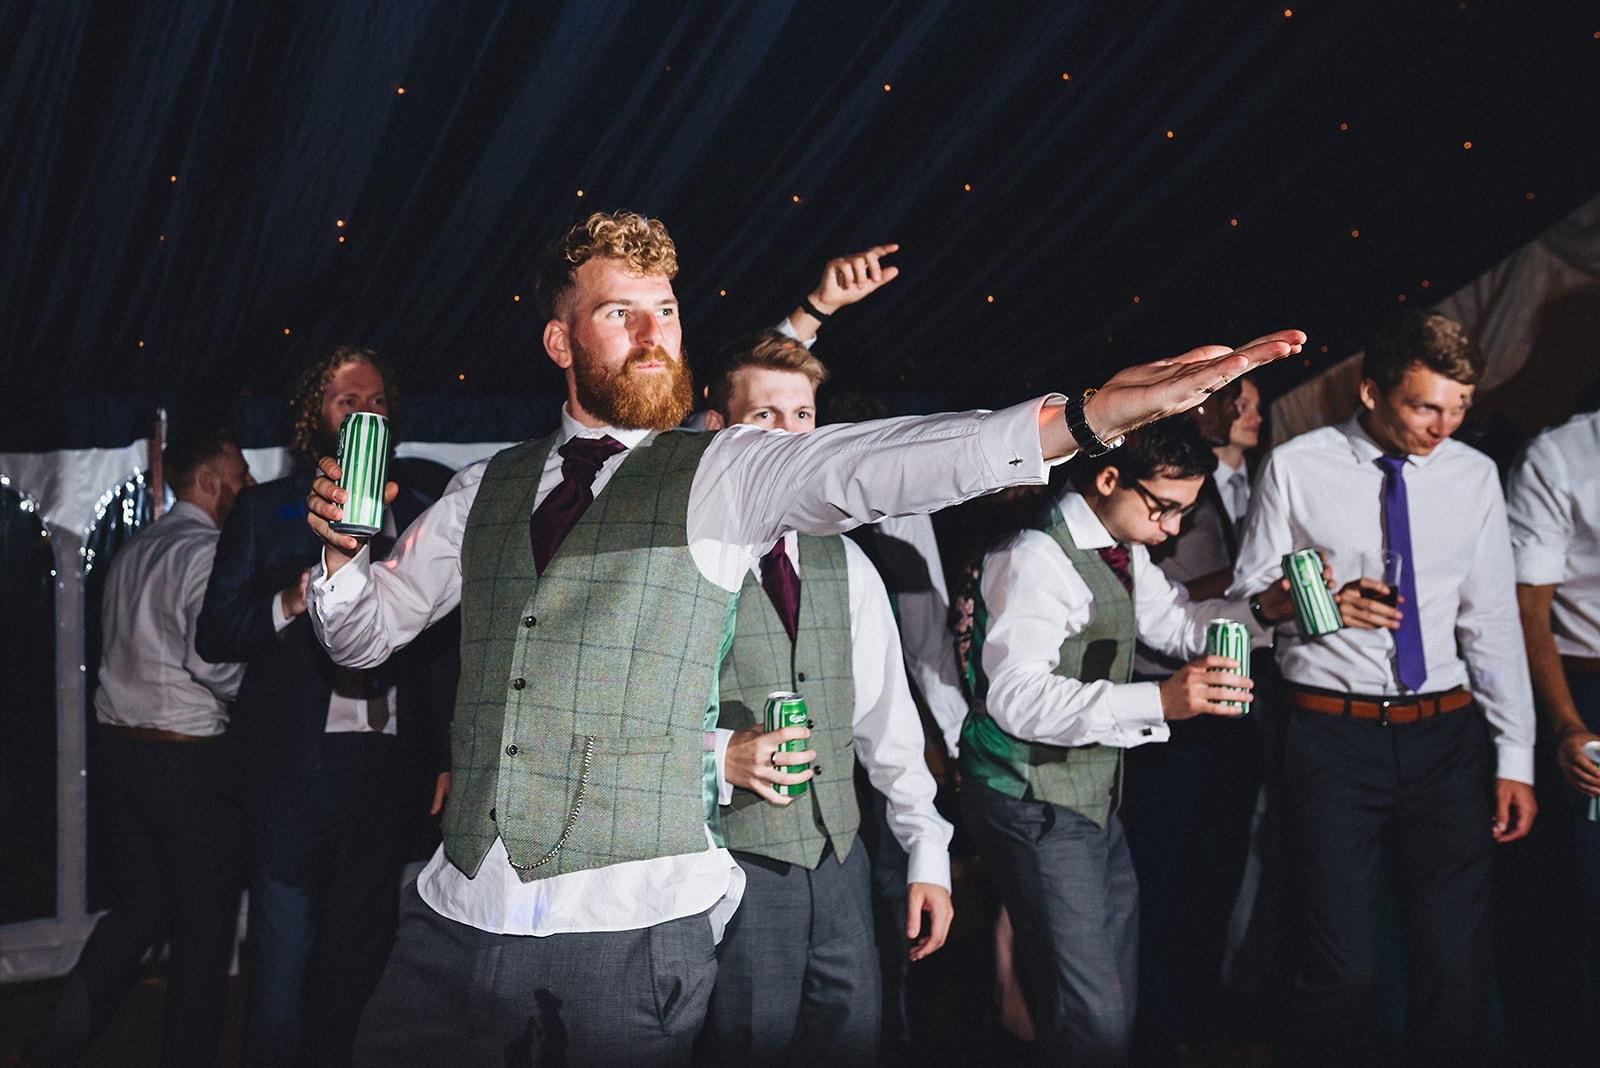 Groom and groomsmen drinking beer on the dance floor